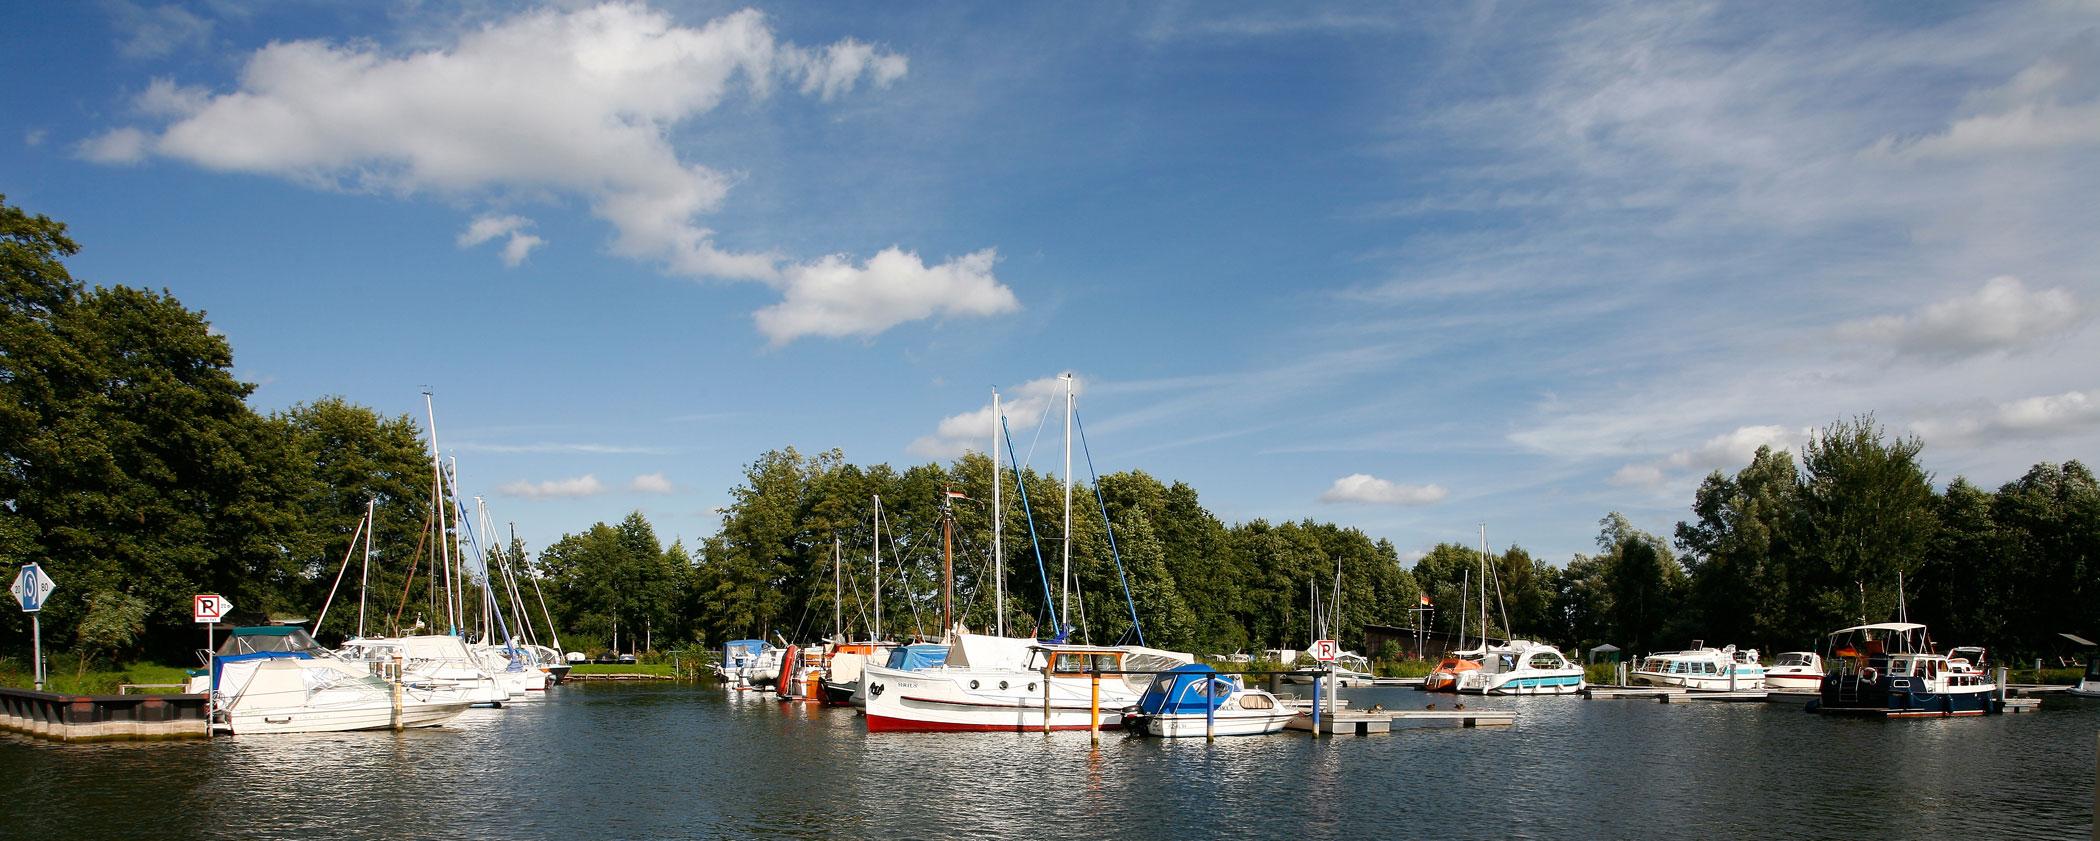 4-Seenfahrt nach Plau am See